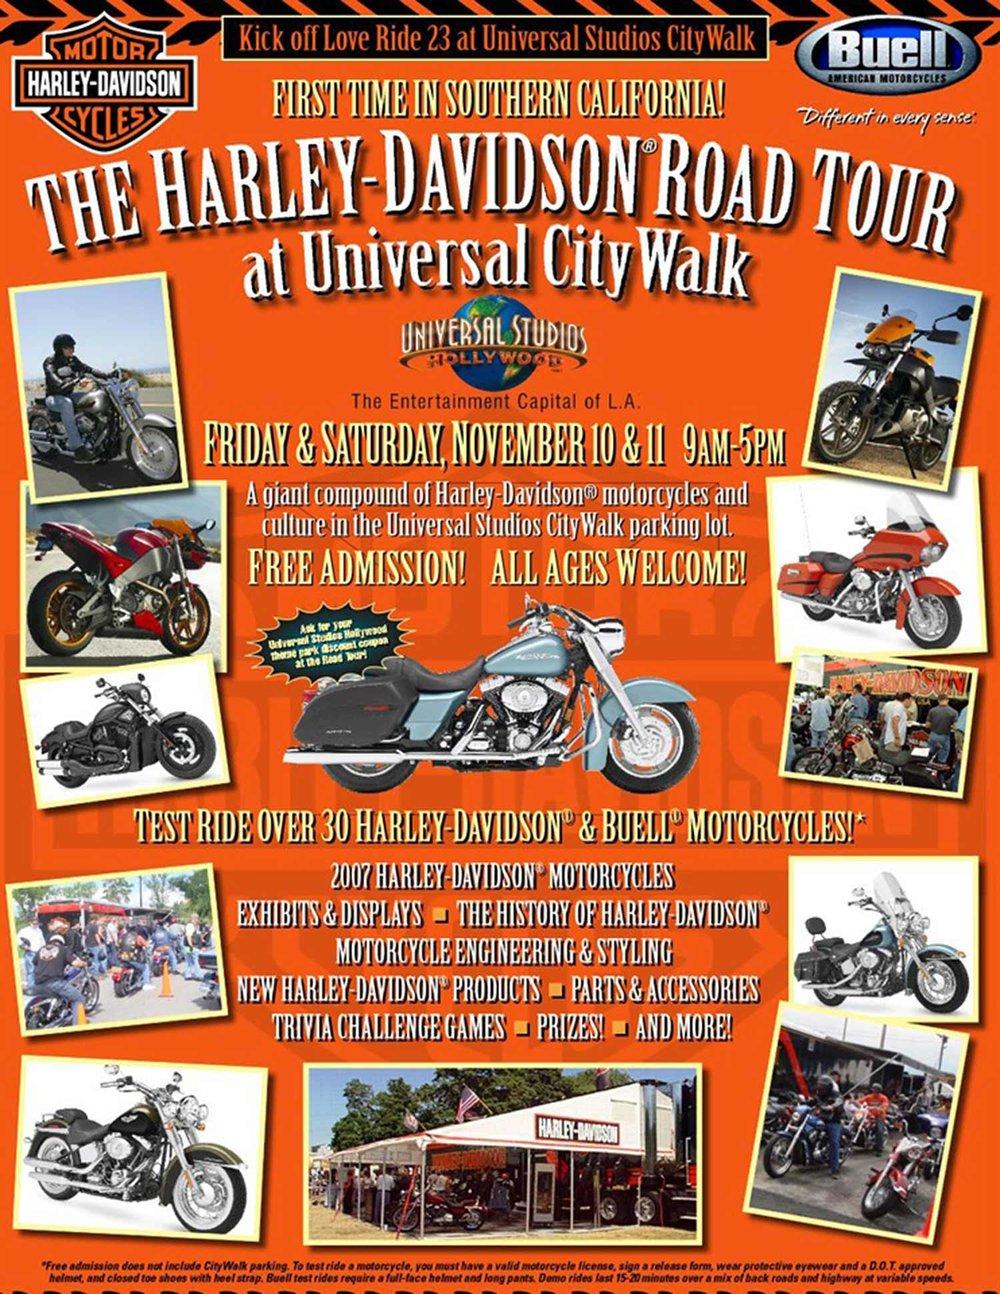 hd-roadtour-1500.jpg